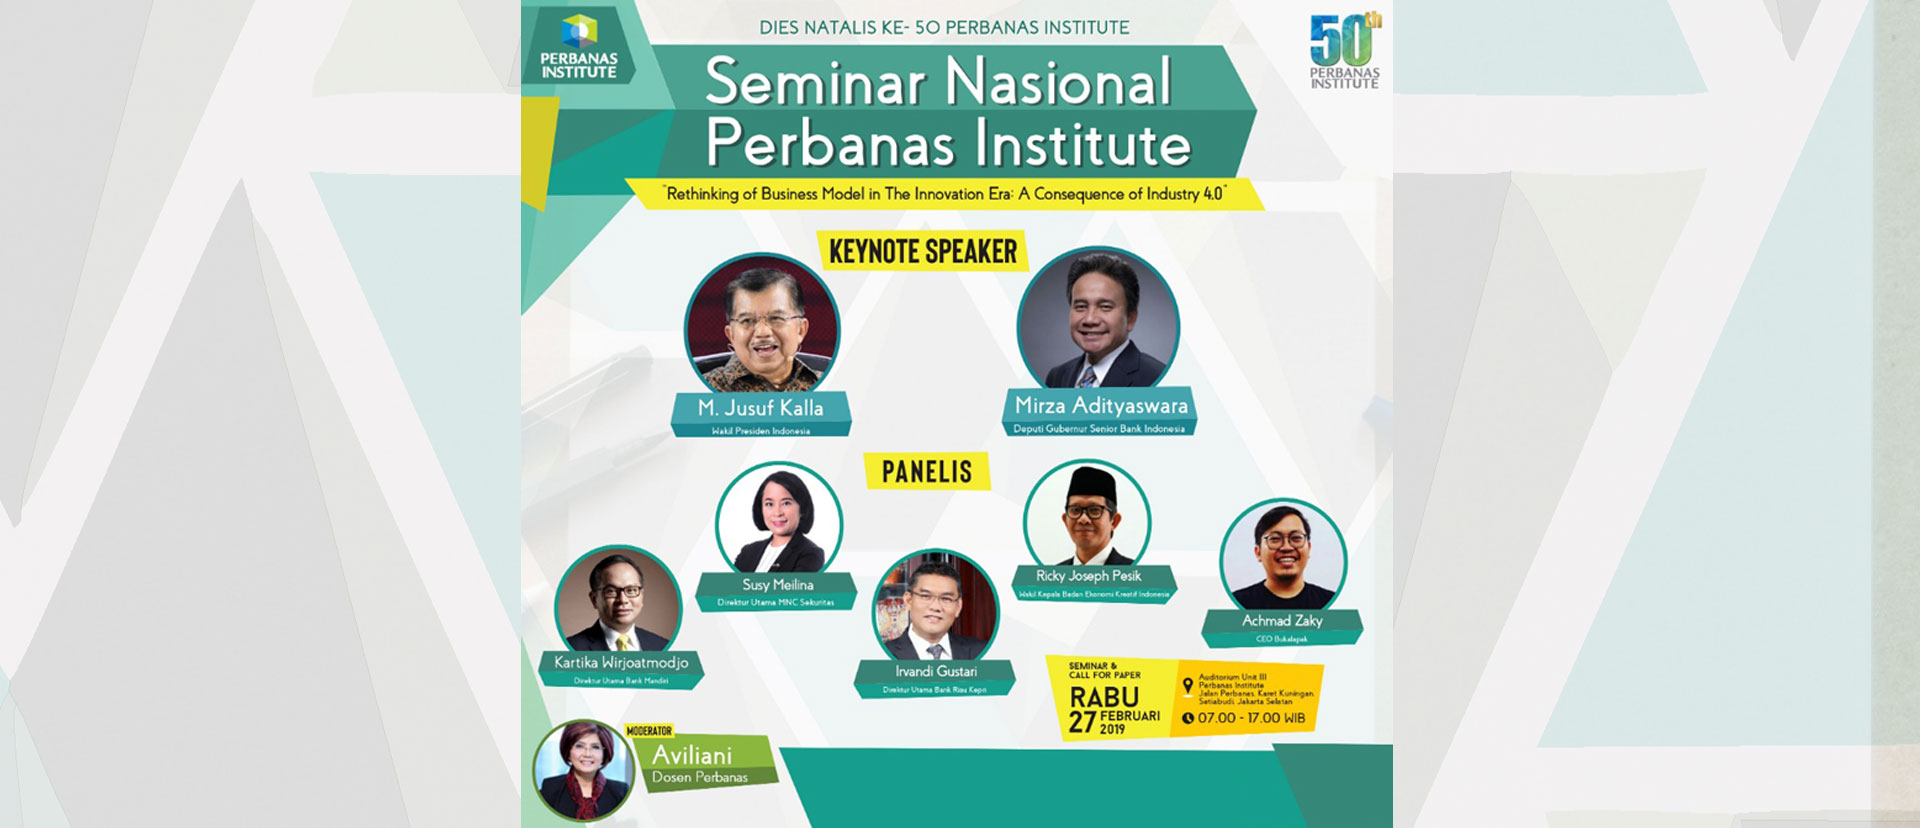 seminar-atas